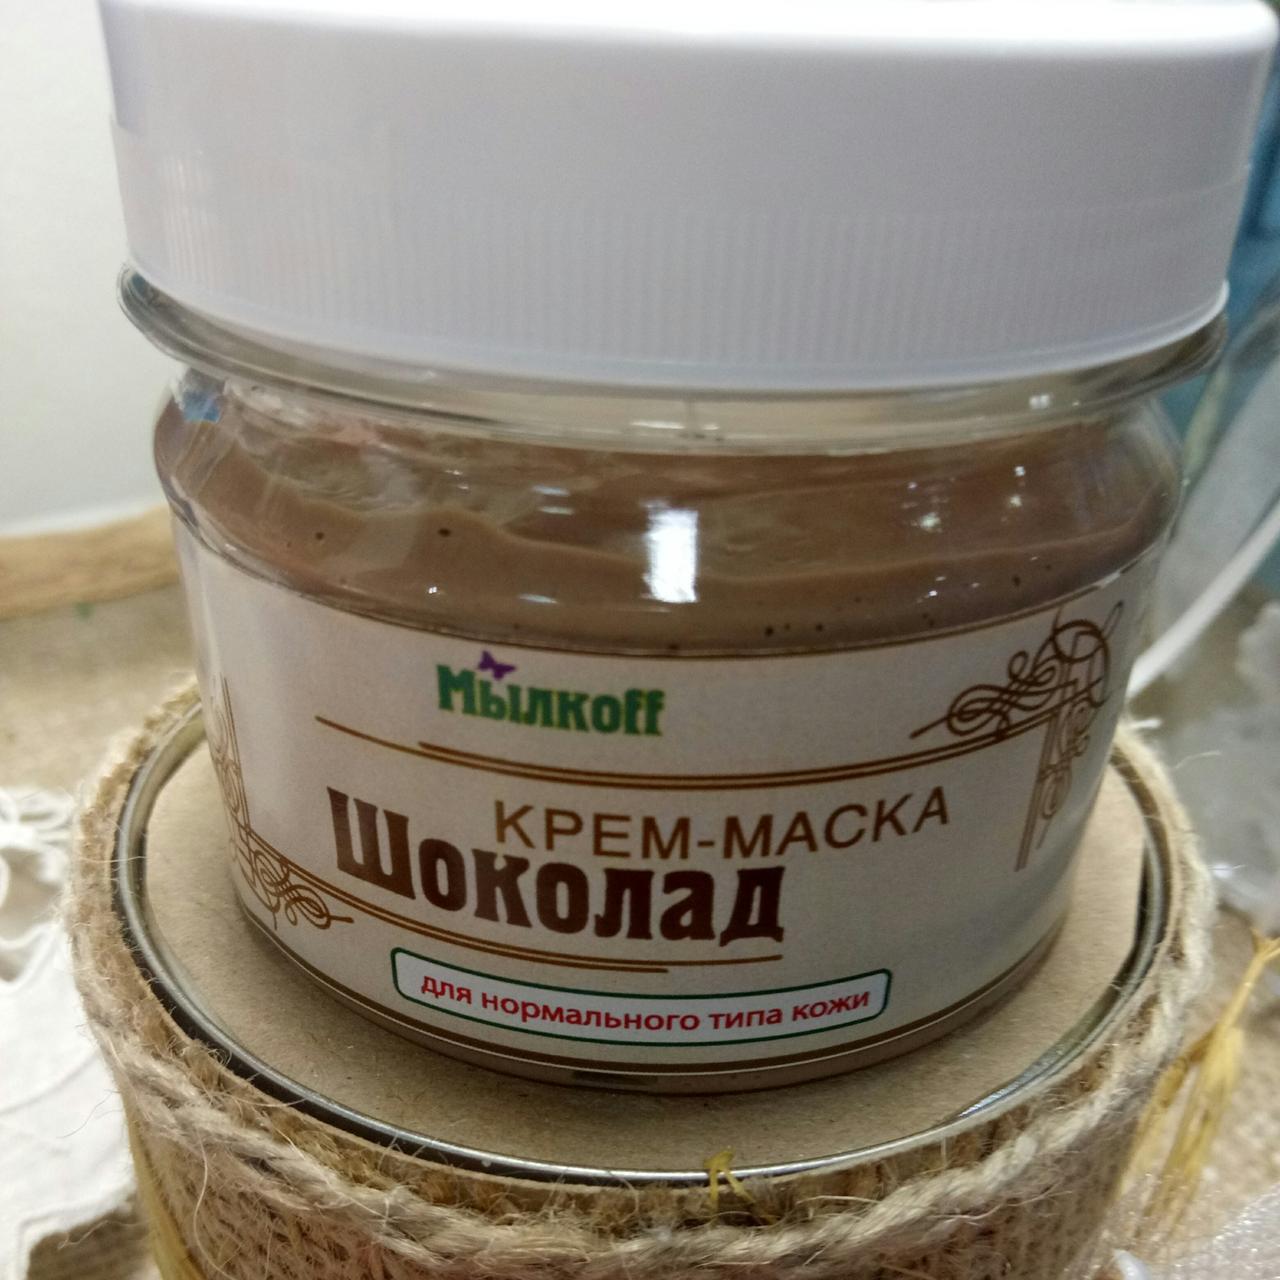 Крем-маска шоколад